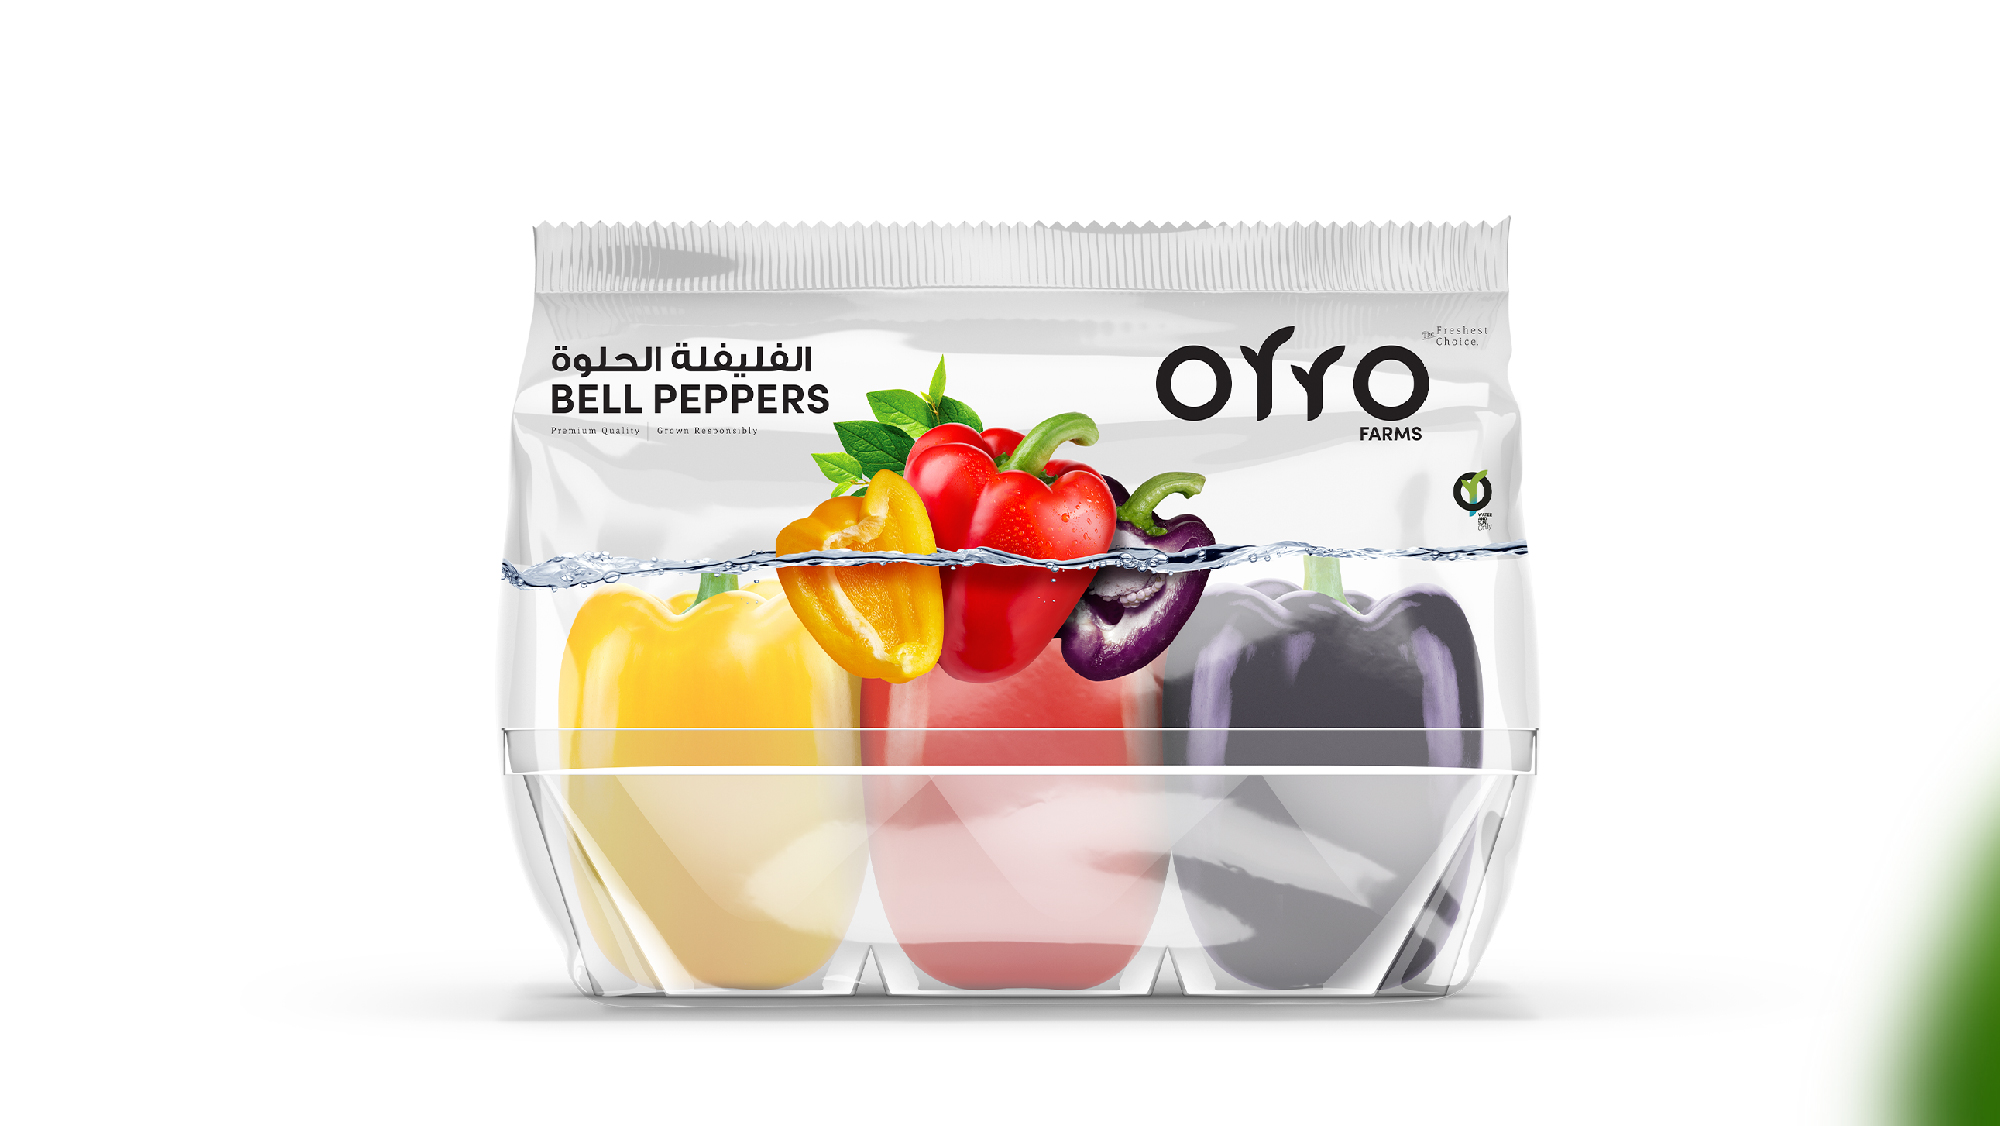 Orro-Farms-04